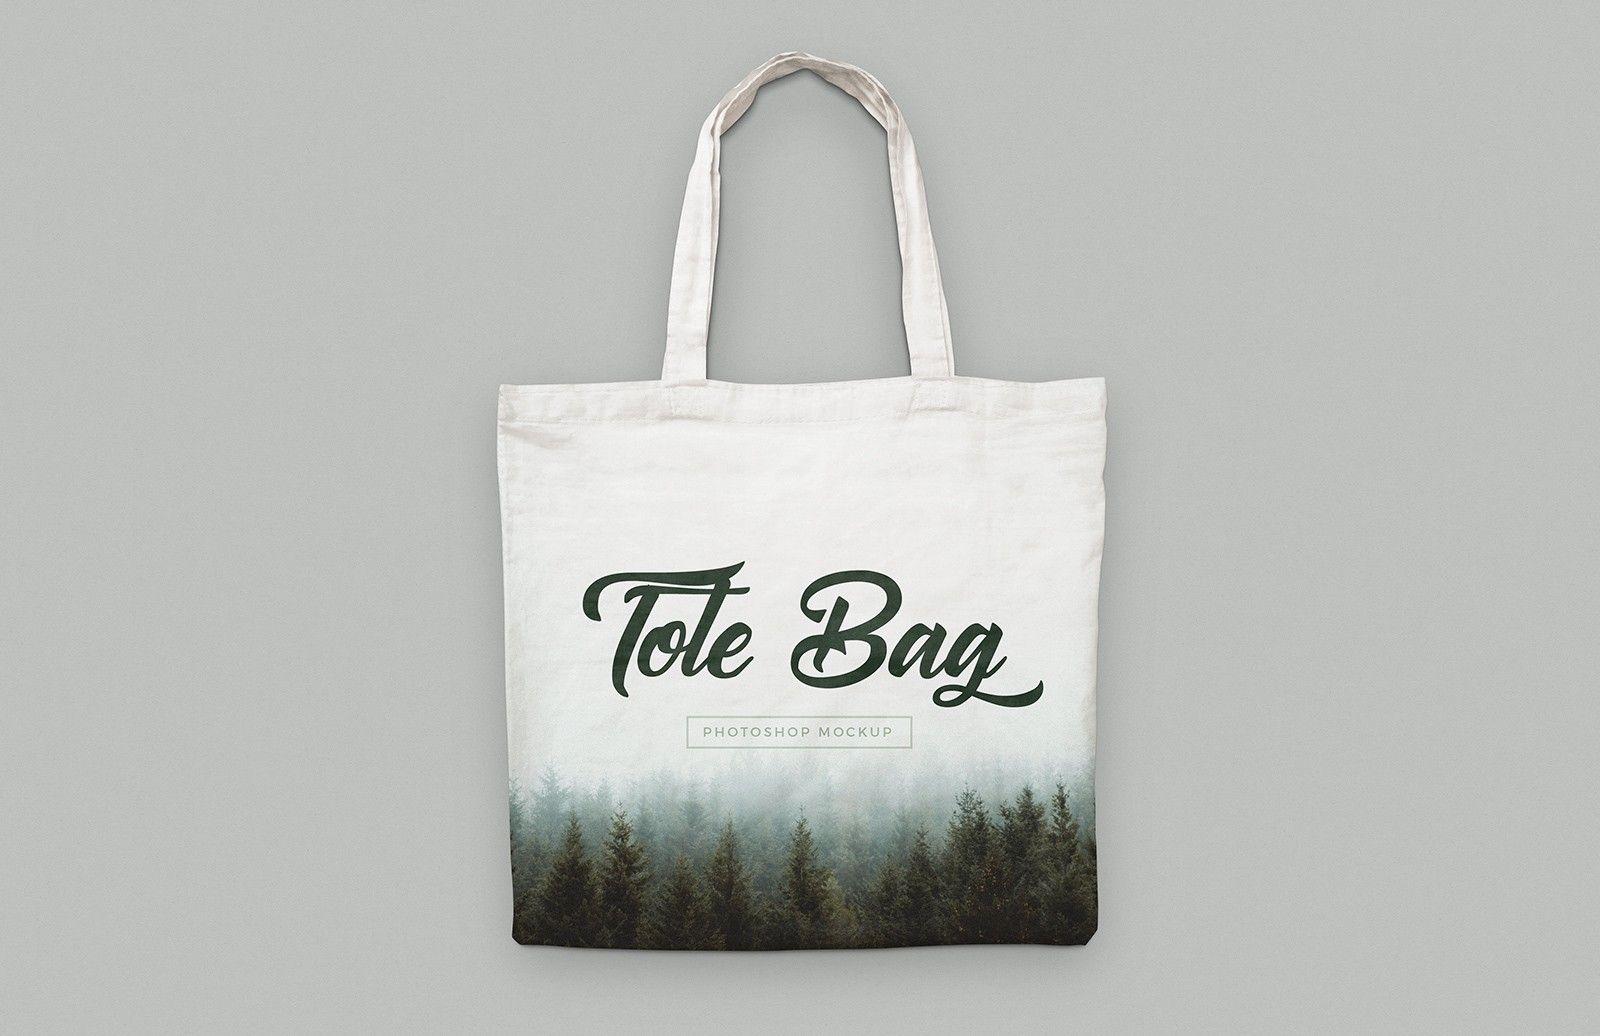 Download Medialoot Free Canvas Tote Bag Mockups Psd Bag Mockup Canvas Tote Bags Tote Bag